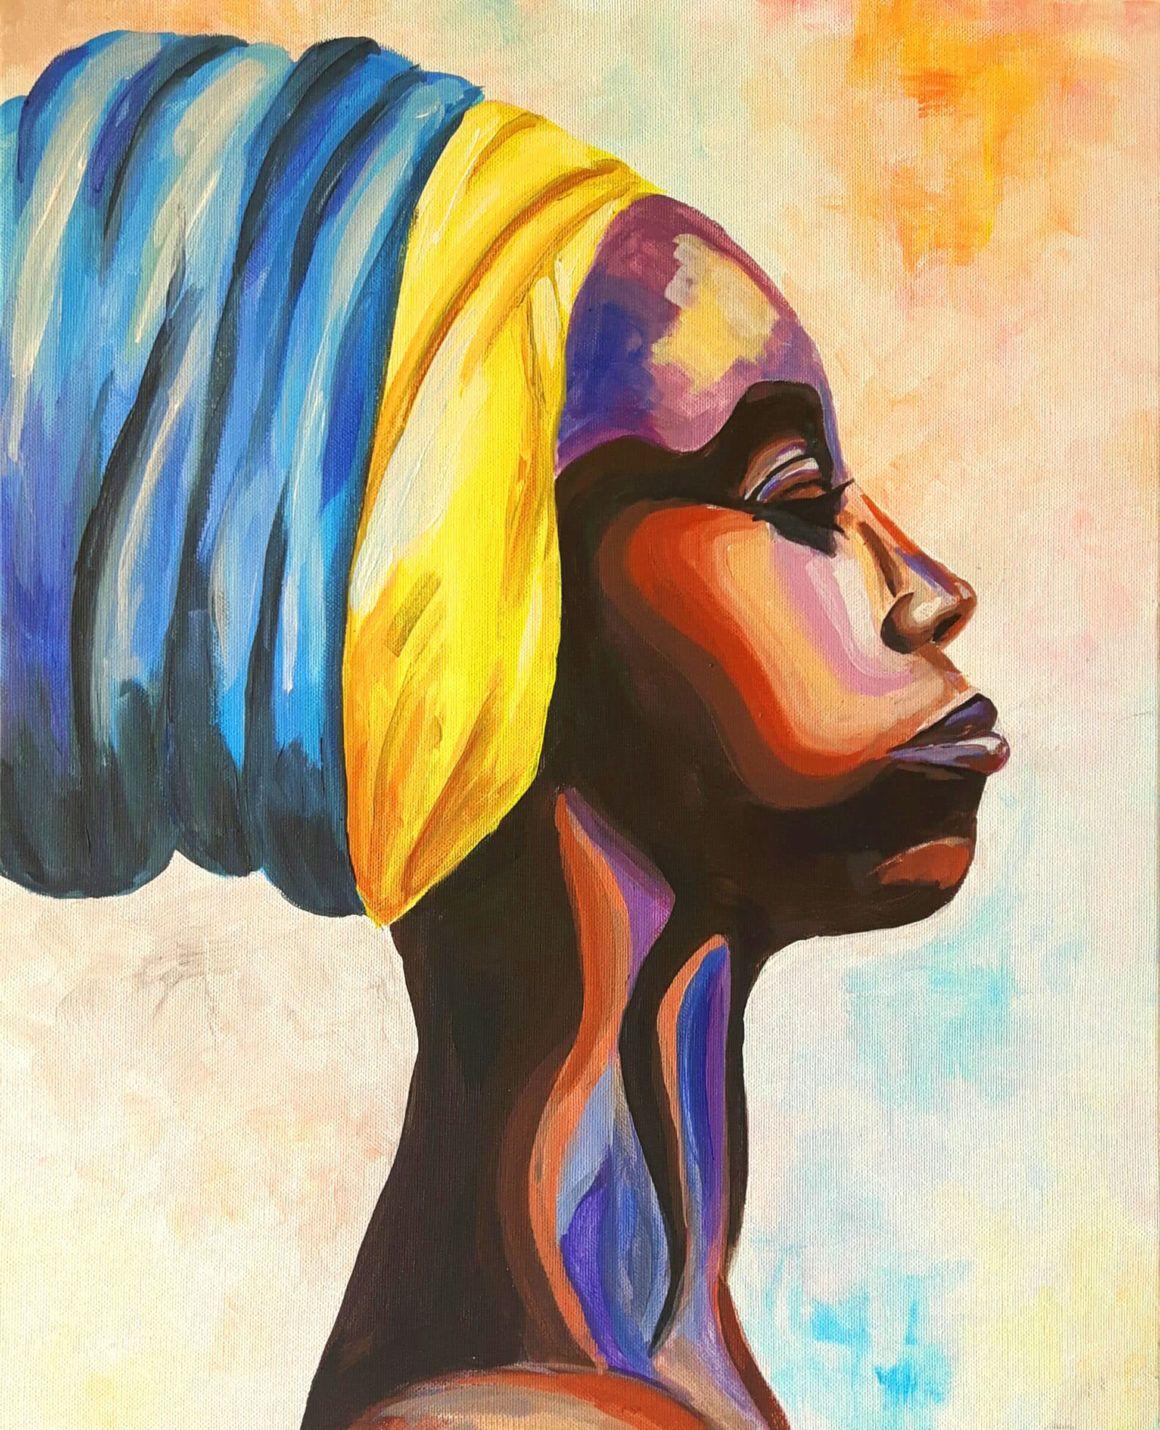 Artmasters African Beauty Acryl Afrikanerin Portrat Leinwand Kreative Events Acryl Leinwand Leinwand Malen Malerei